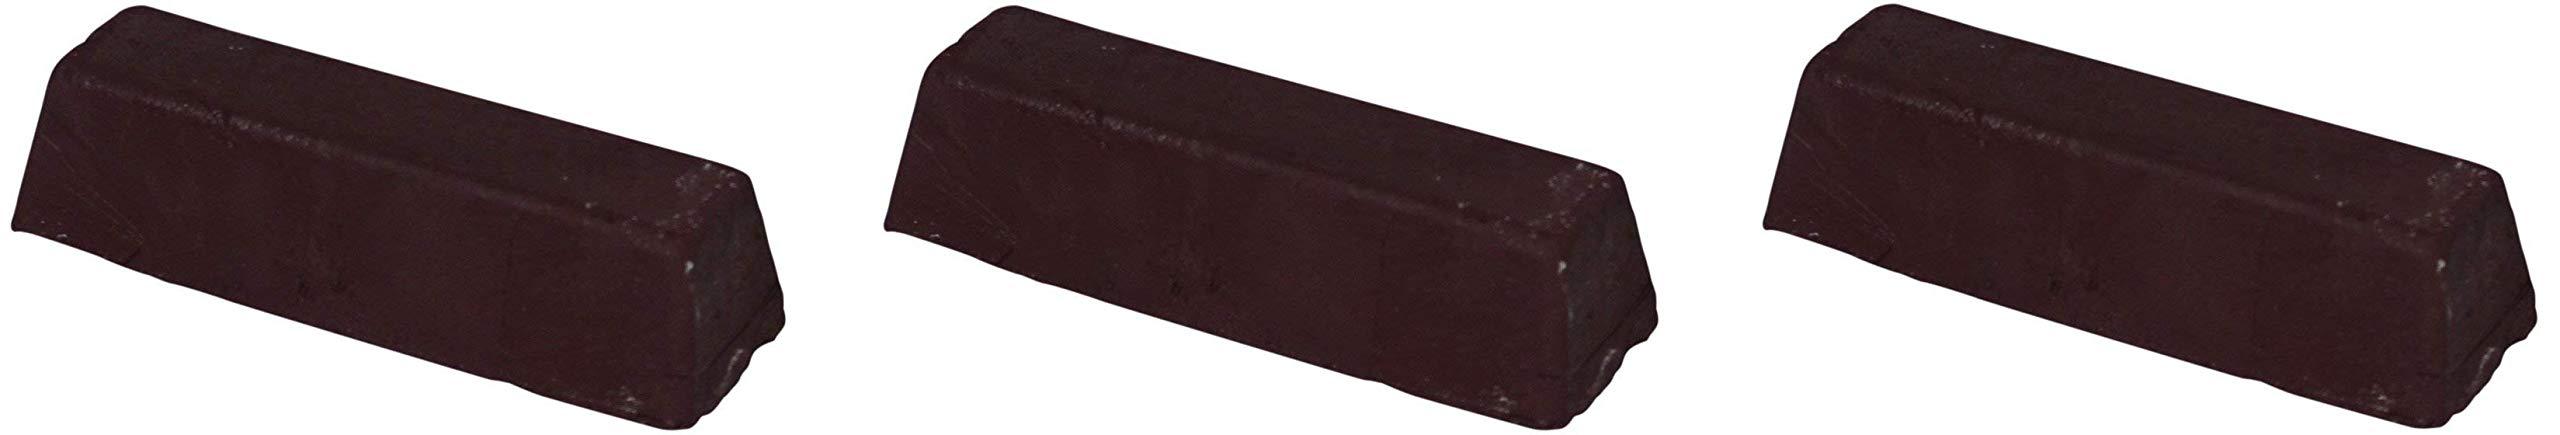 JacksonLea 47351SP Brown Buffing Compound, Grande Bar, 2'' Width x 2'' Height x 9'' Length (Thrее Рack)